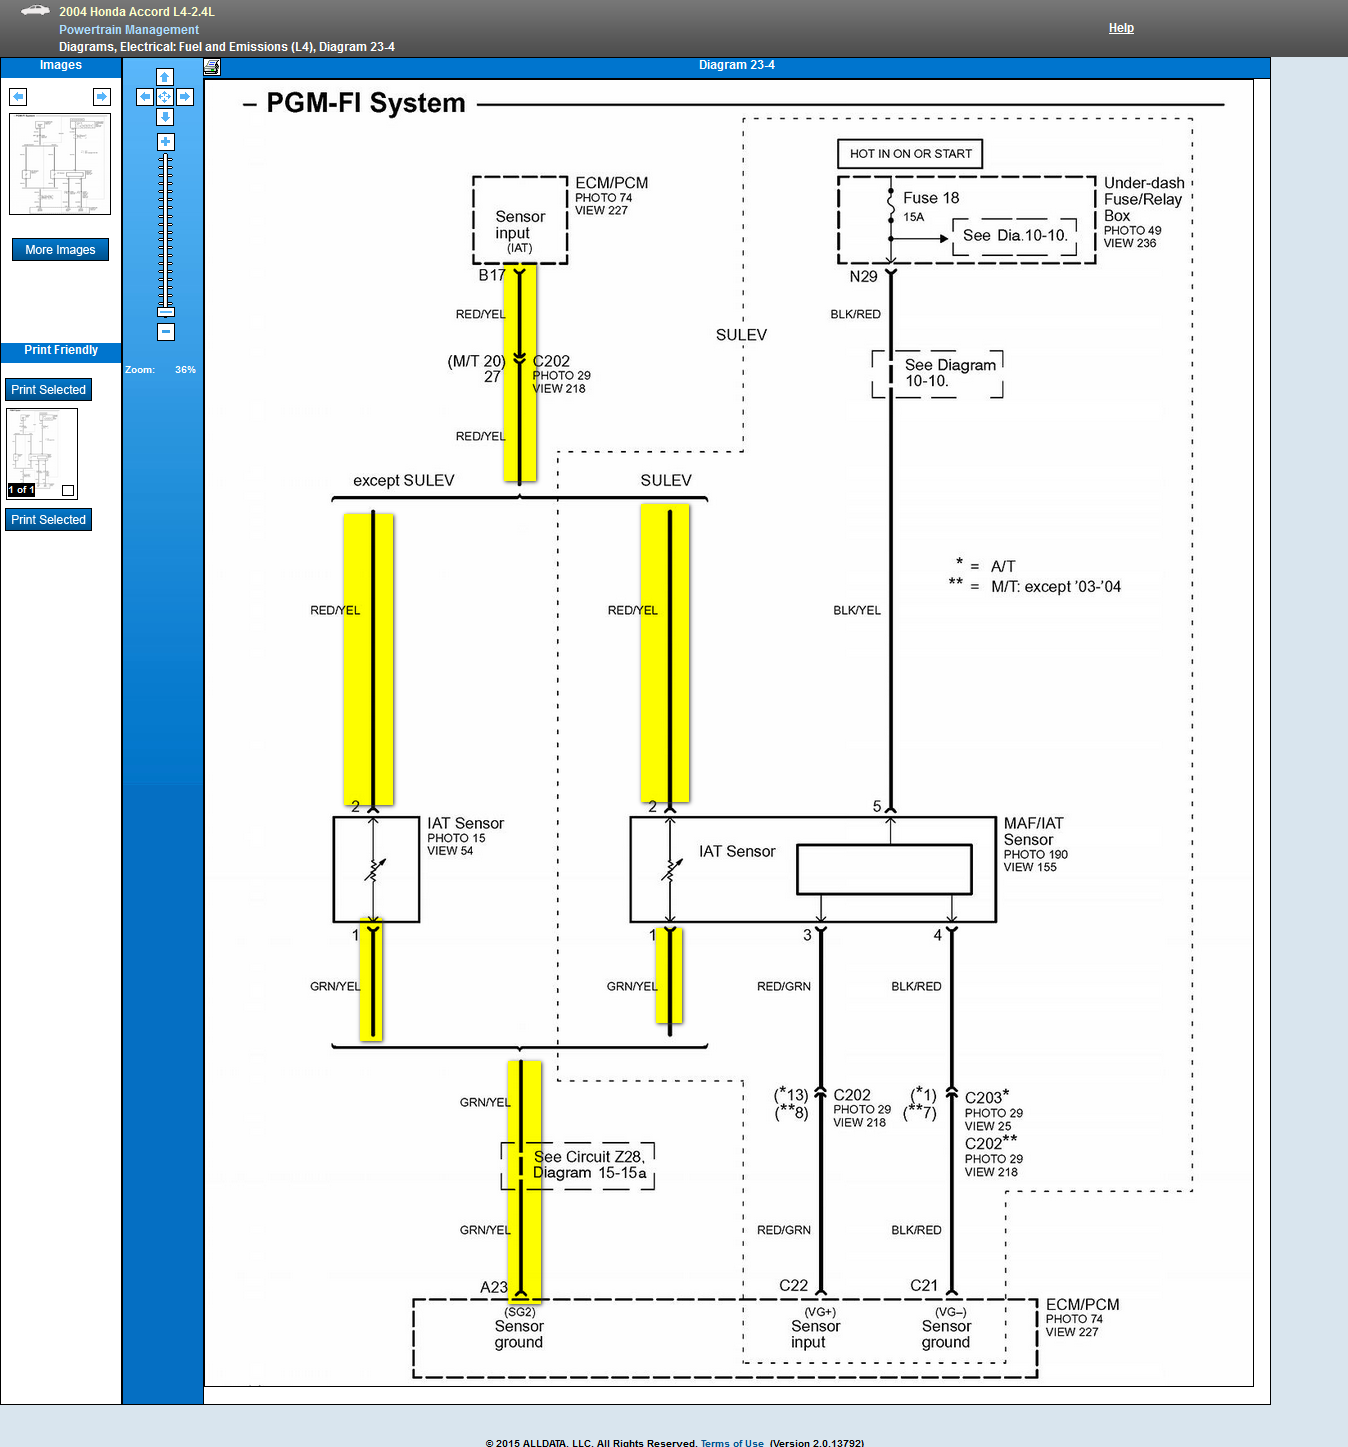 Honda Fuel Injector Wiring Diagram On Honda Accord Obd Location